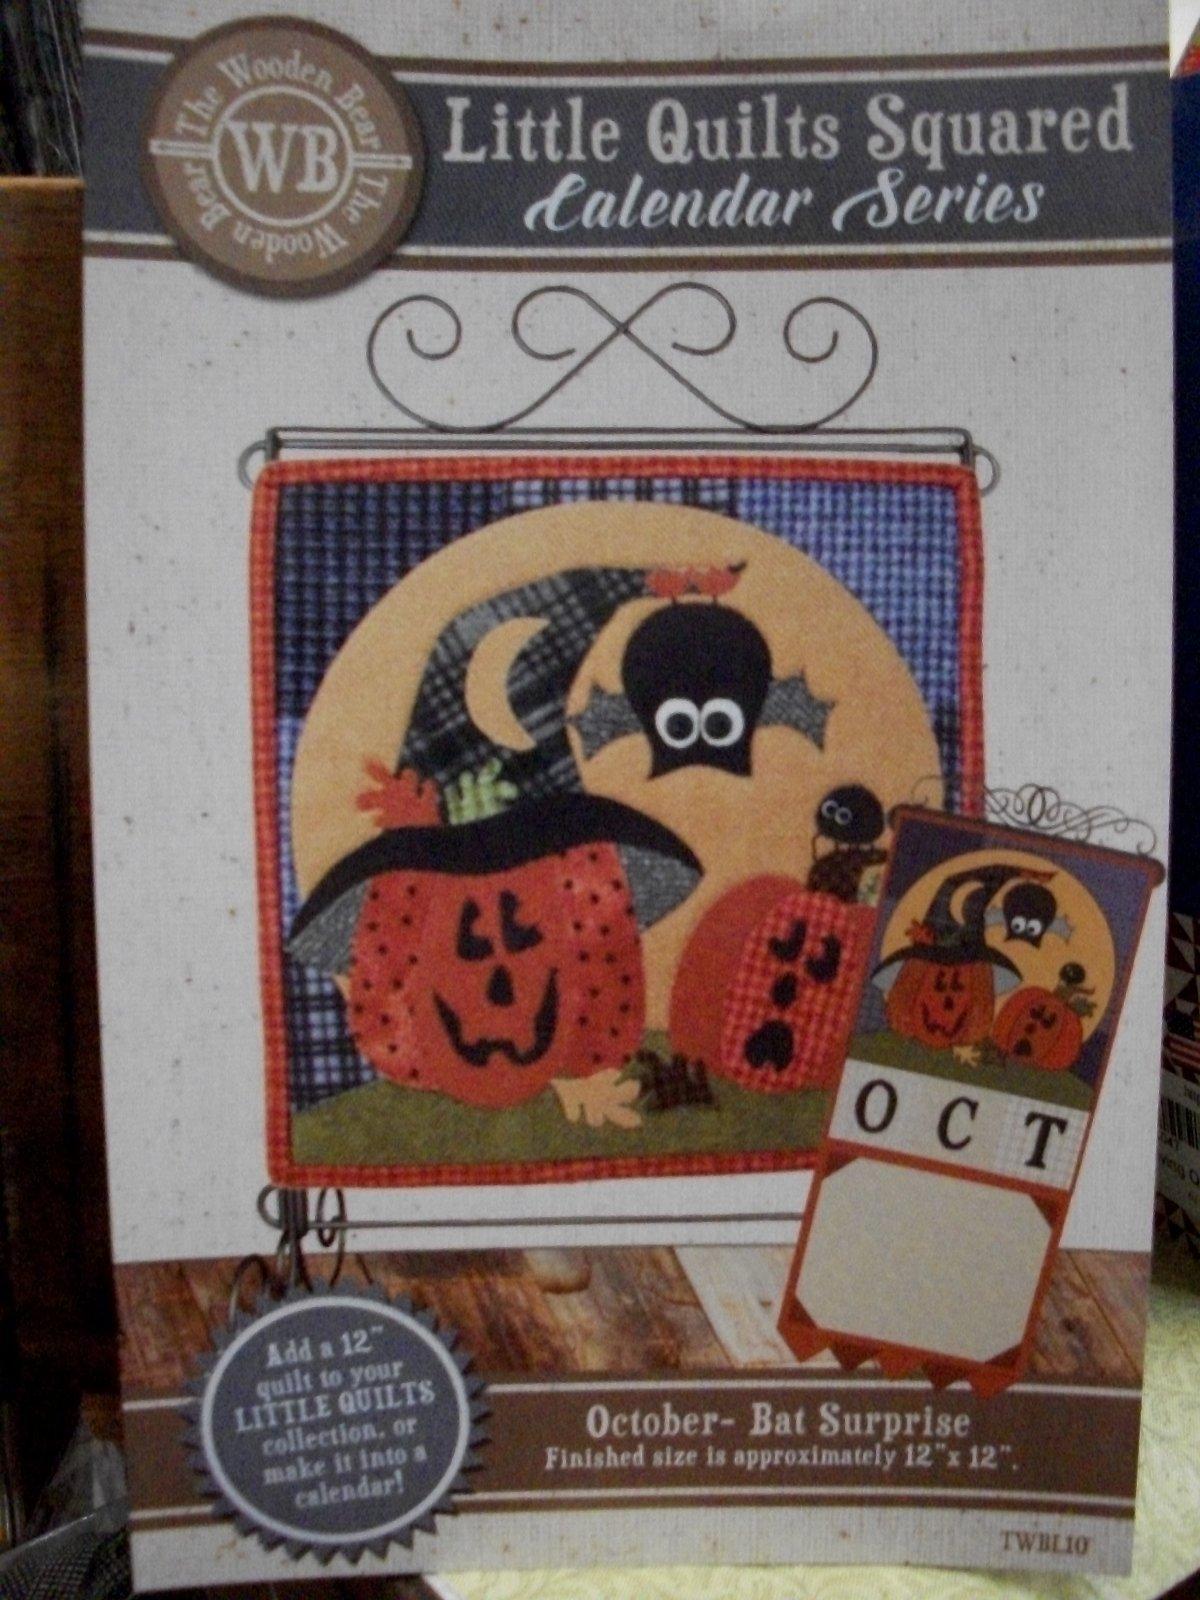 October-Bat Surprise